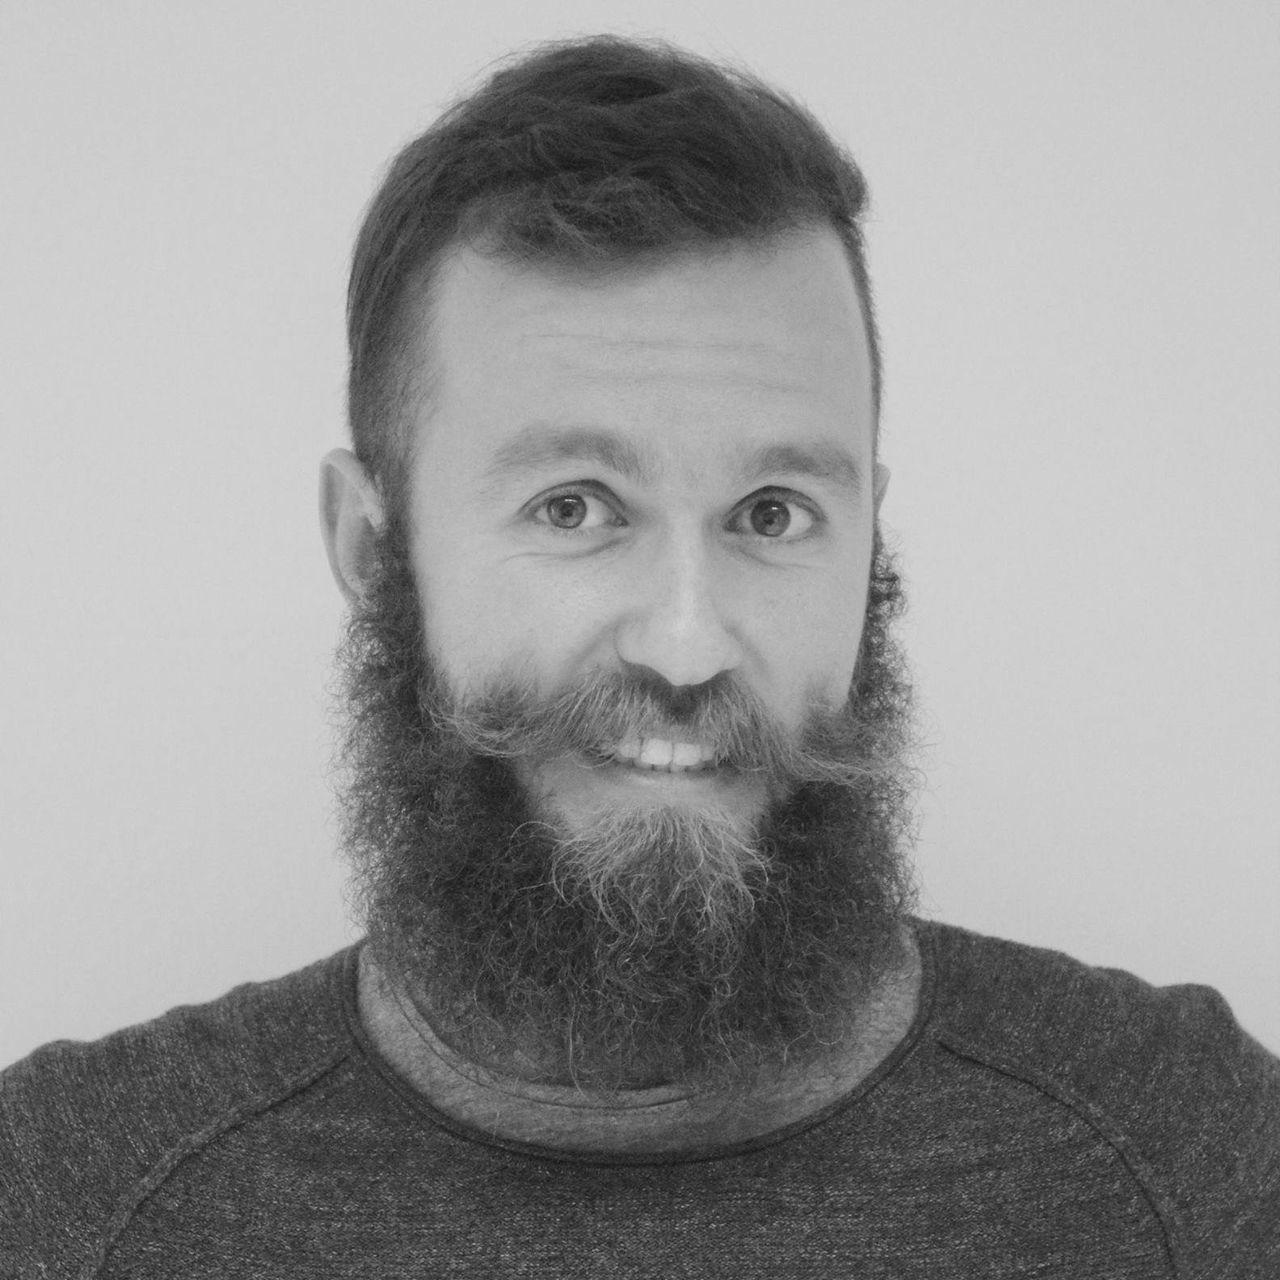 Bearded Beards Blackandwhite Confidence  Mustache Portrait Profile Random Real People First Eyeem Photo